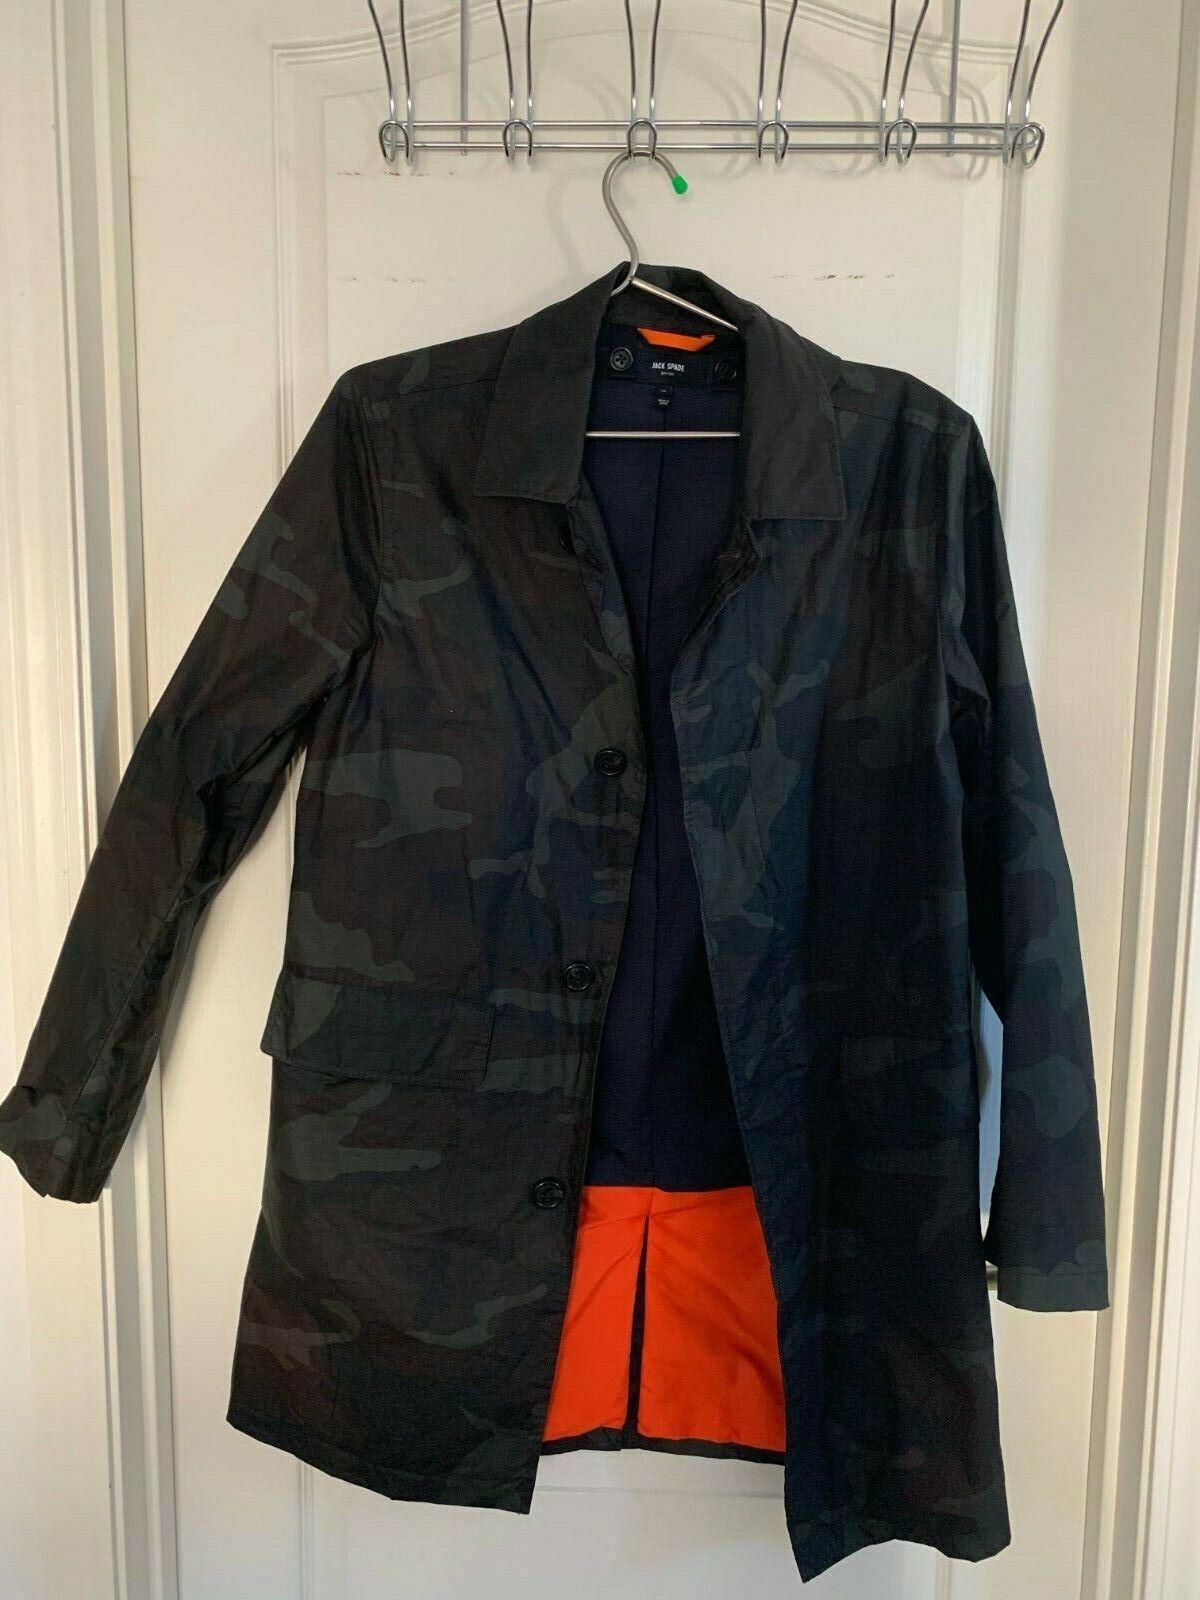 Jack Spade Wax Cotton Raincoat / Car coat size S Imported wi